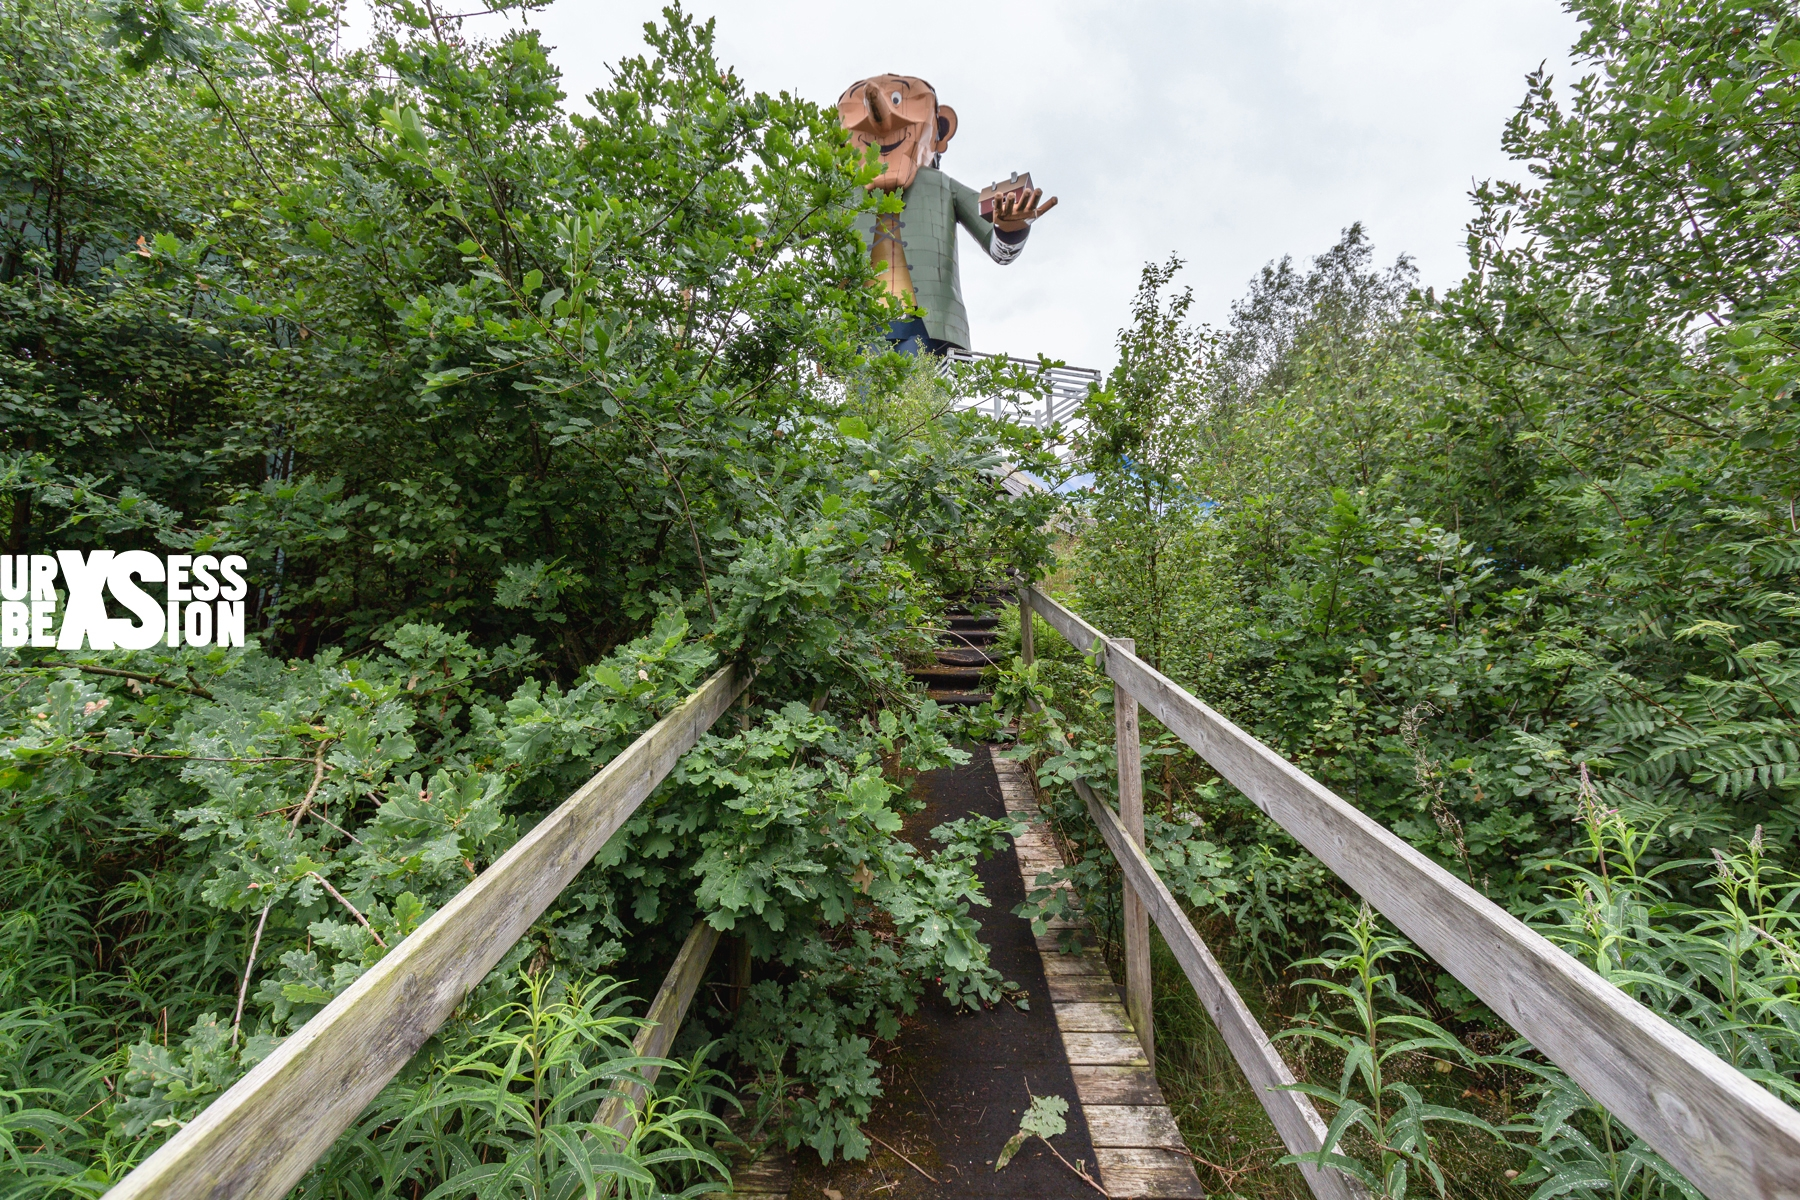 Parc d'attraction abandonné | urbexsession.com/big-world-land | Urbex Suède